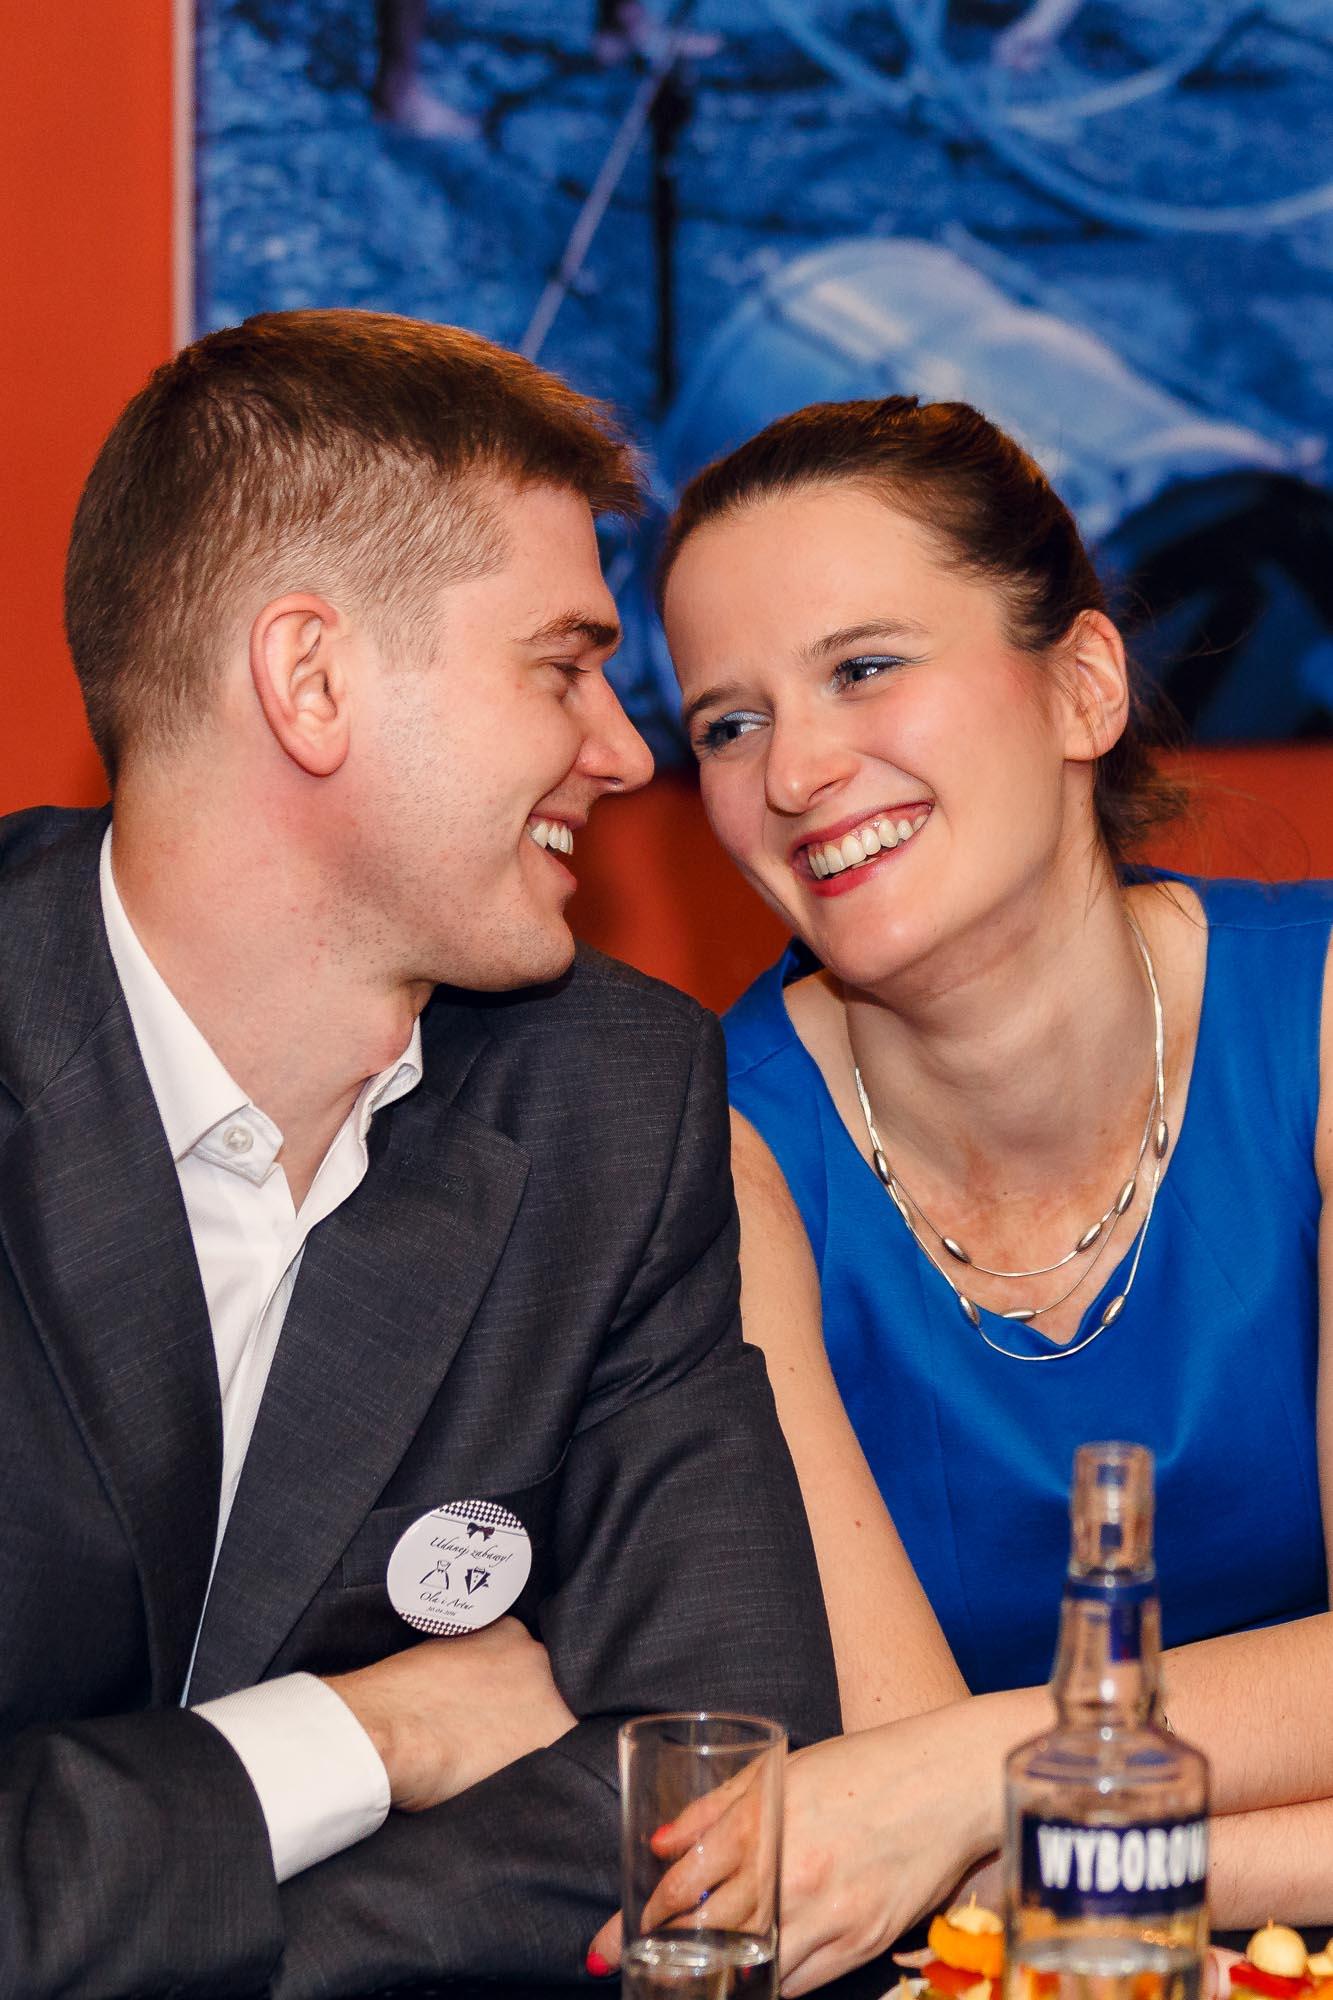 20150423 11-59-05 Justyna i Tomasz